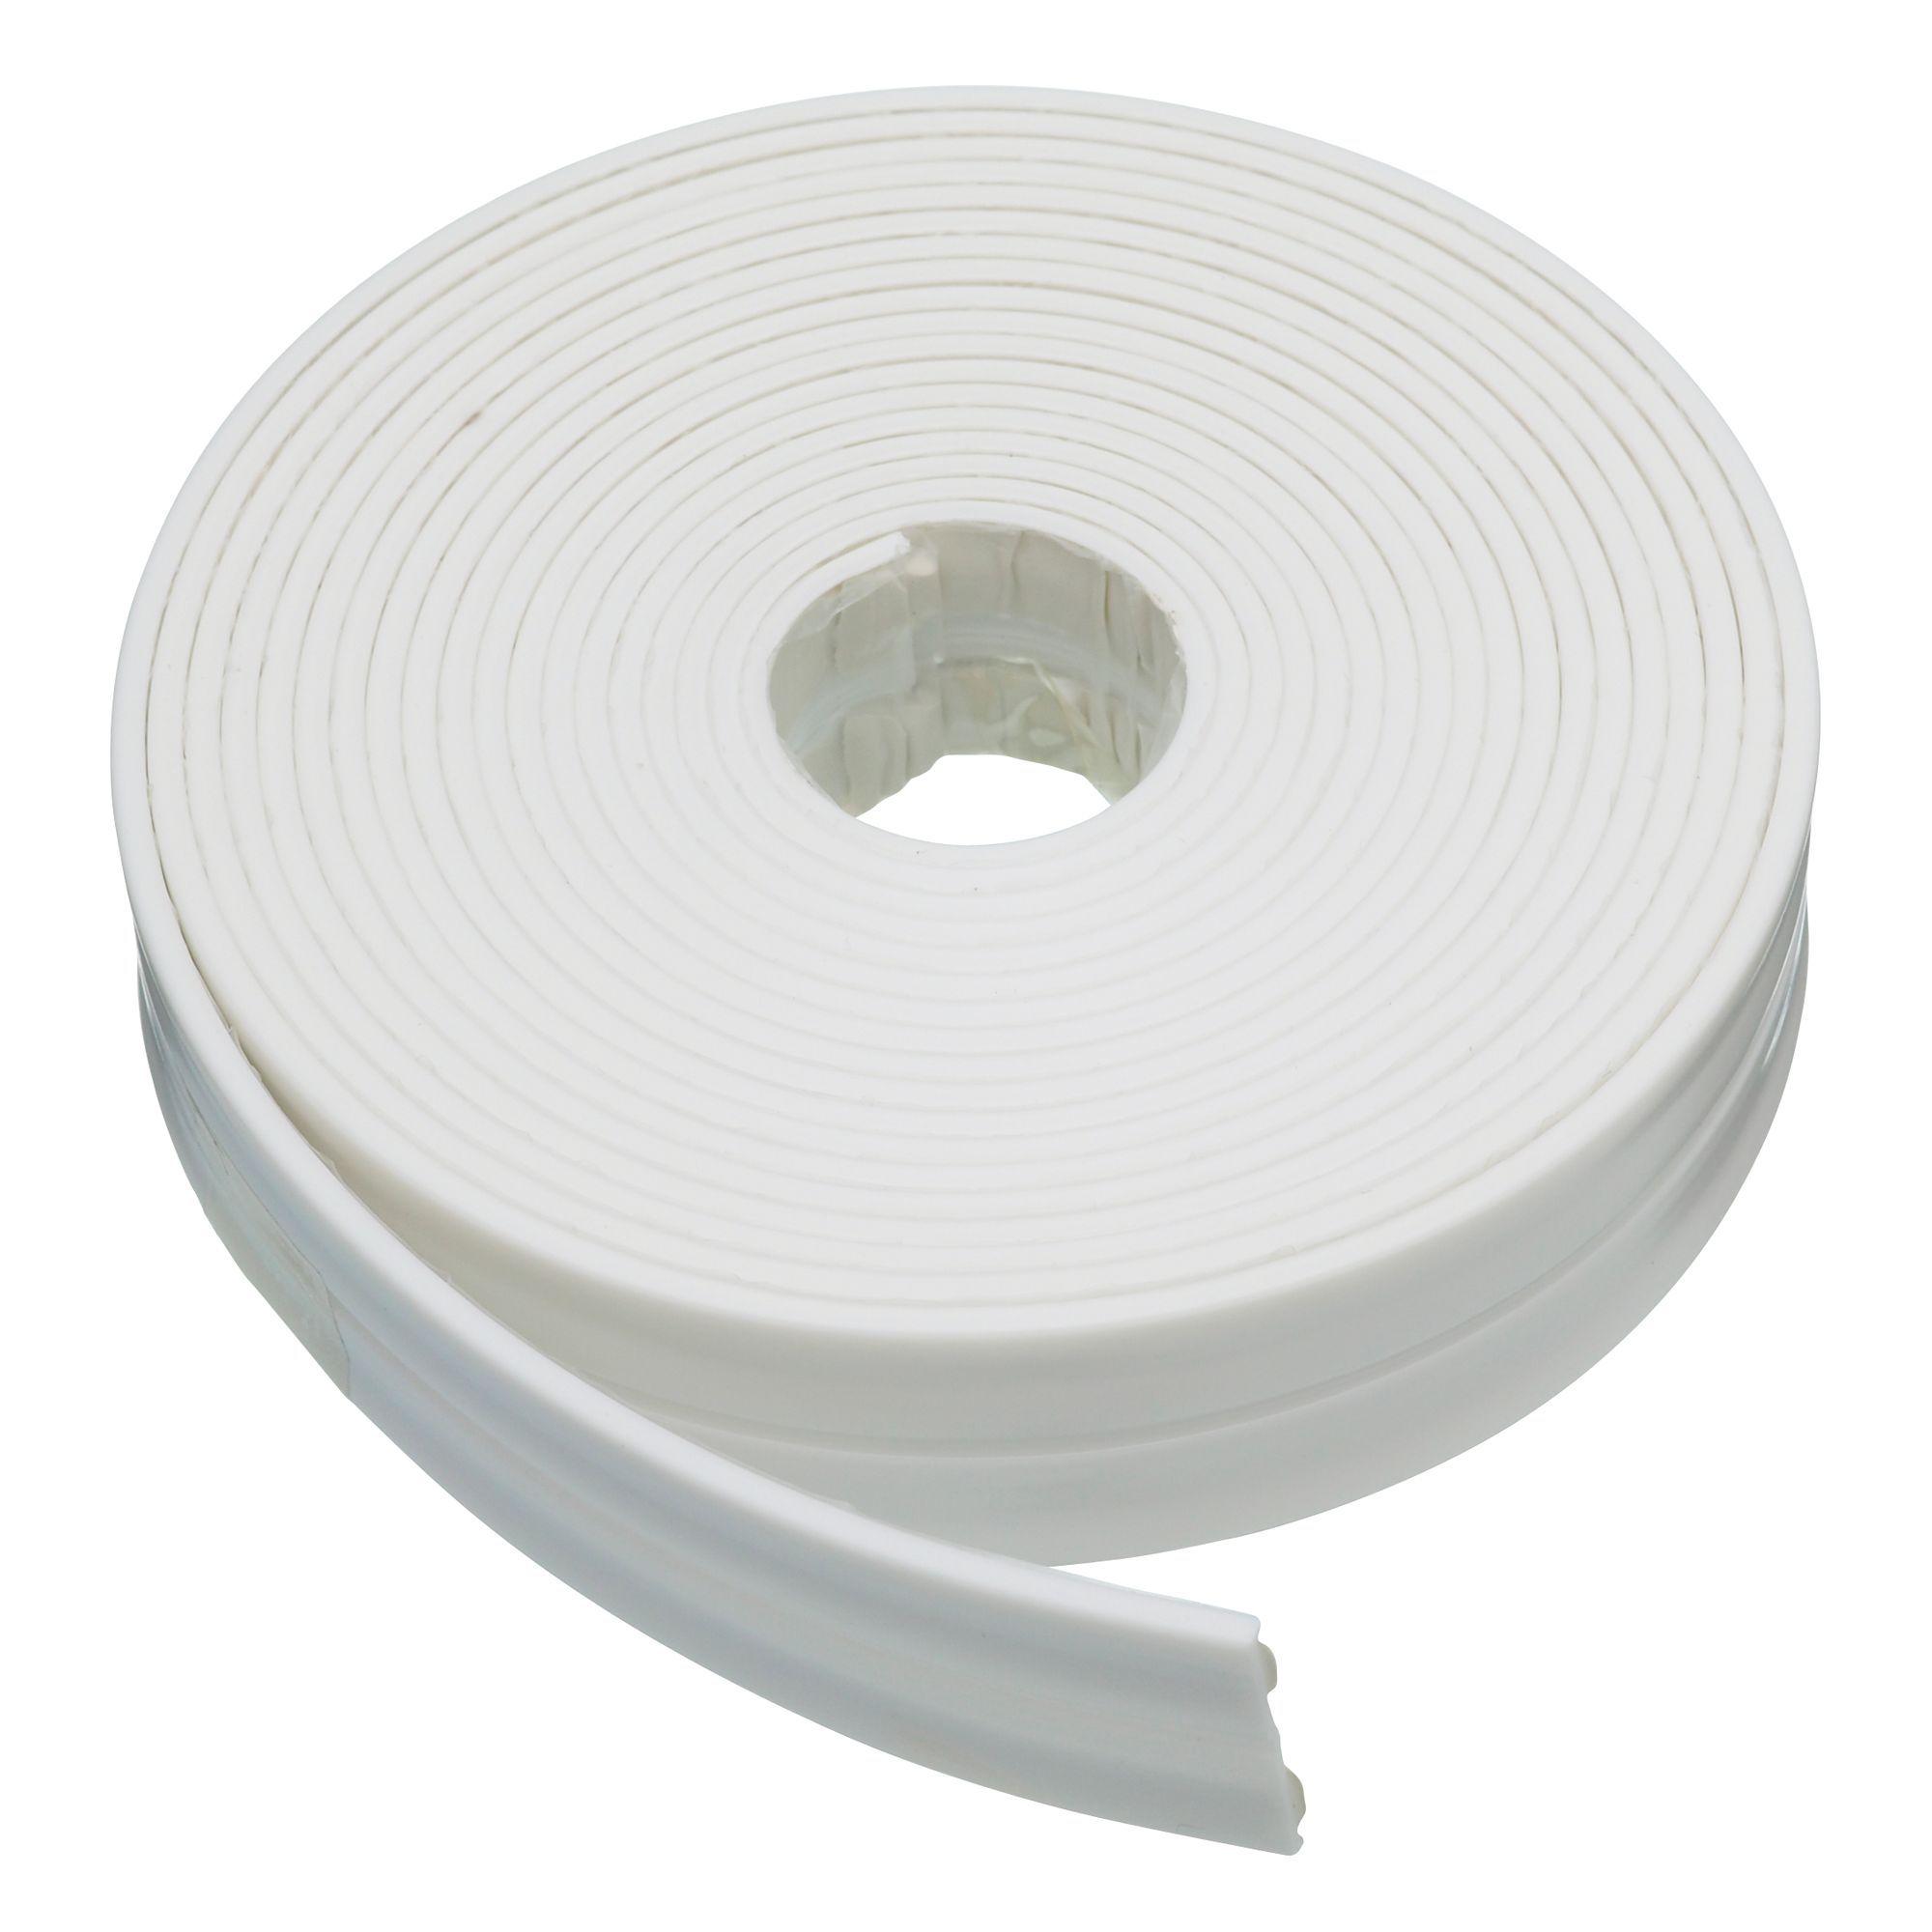 Homelux White Flexible Bath Seal L 3500mm Departments